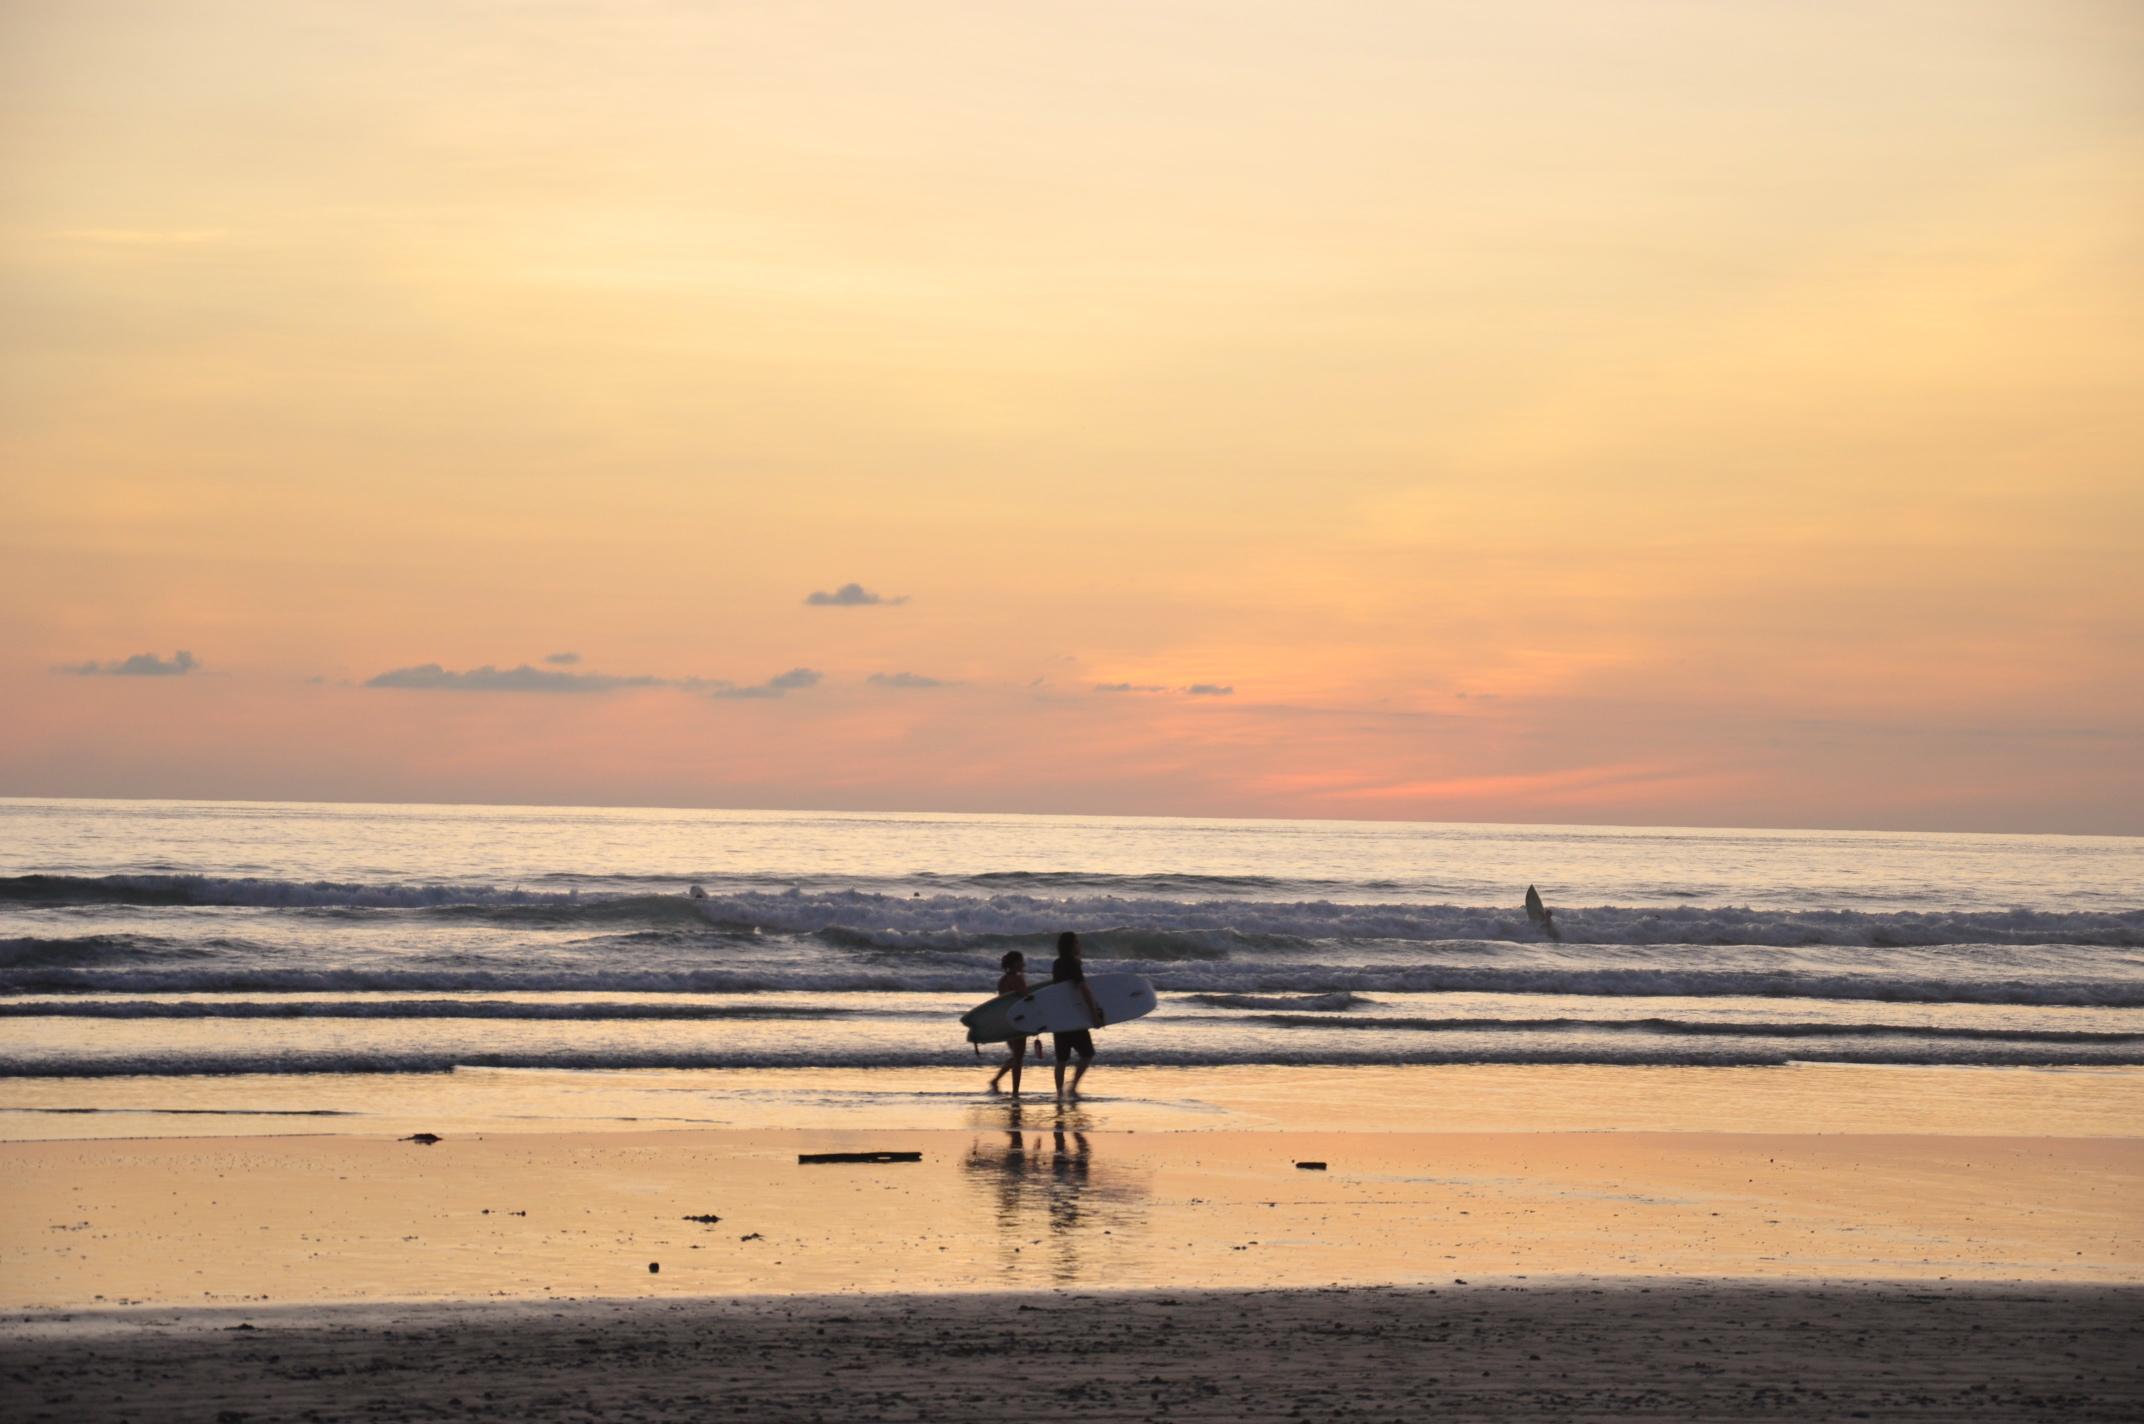 Sunset at Playa Hermosa